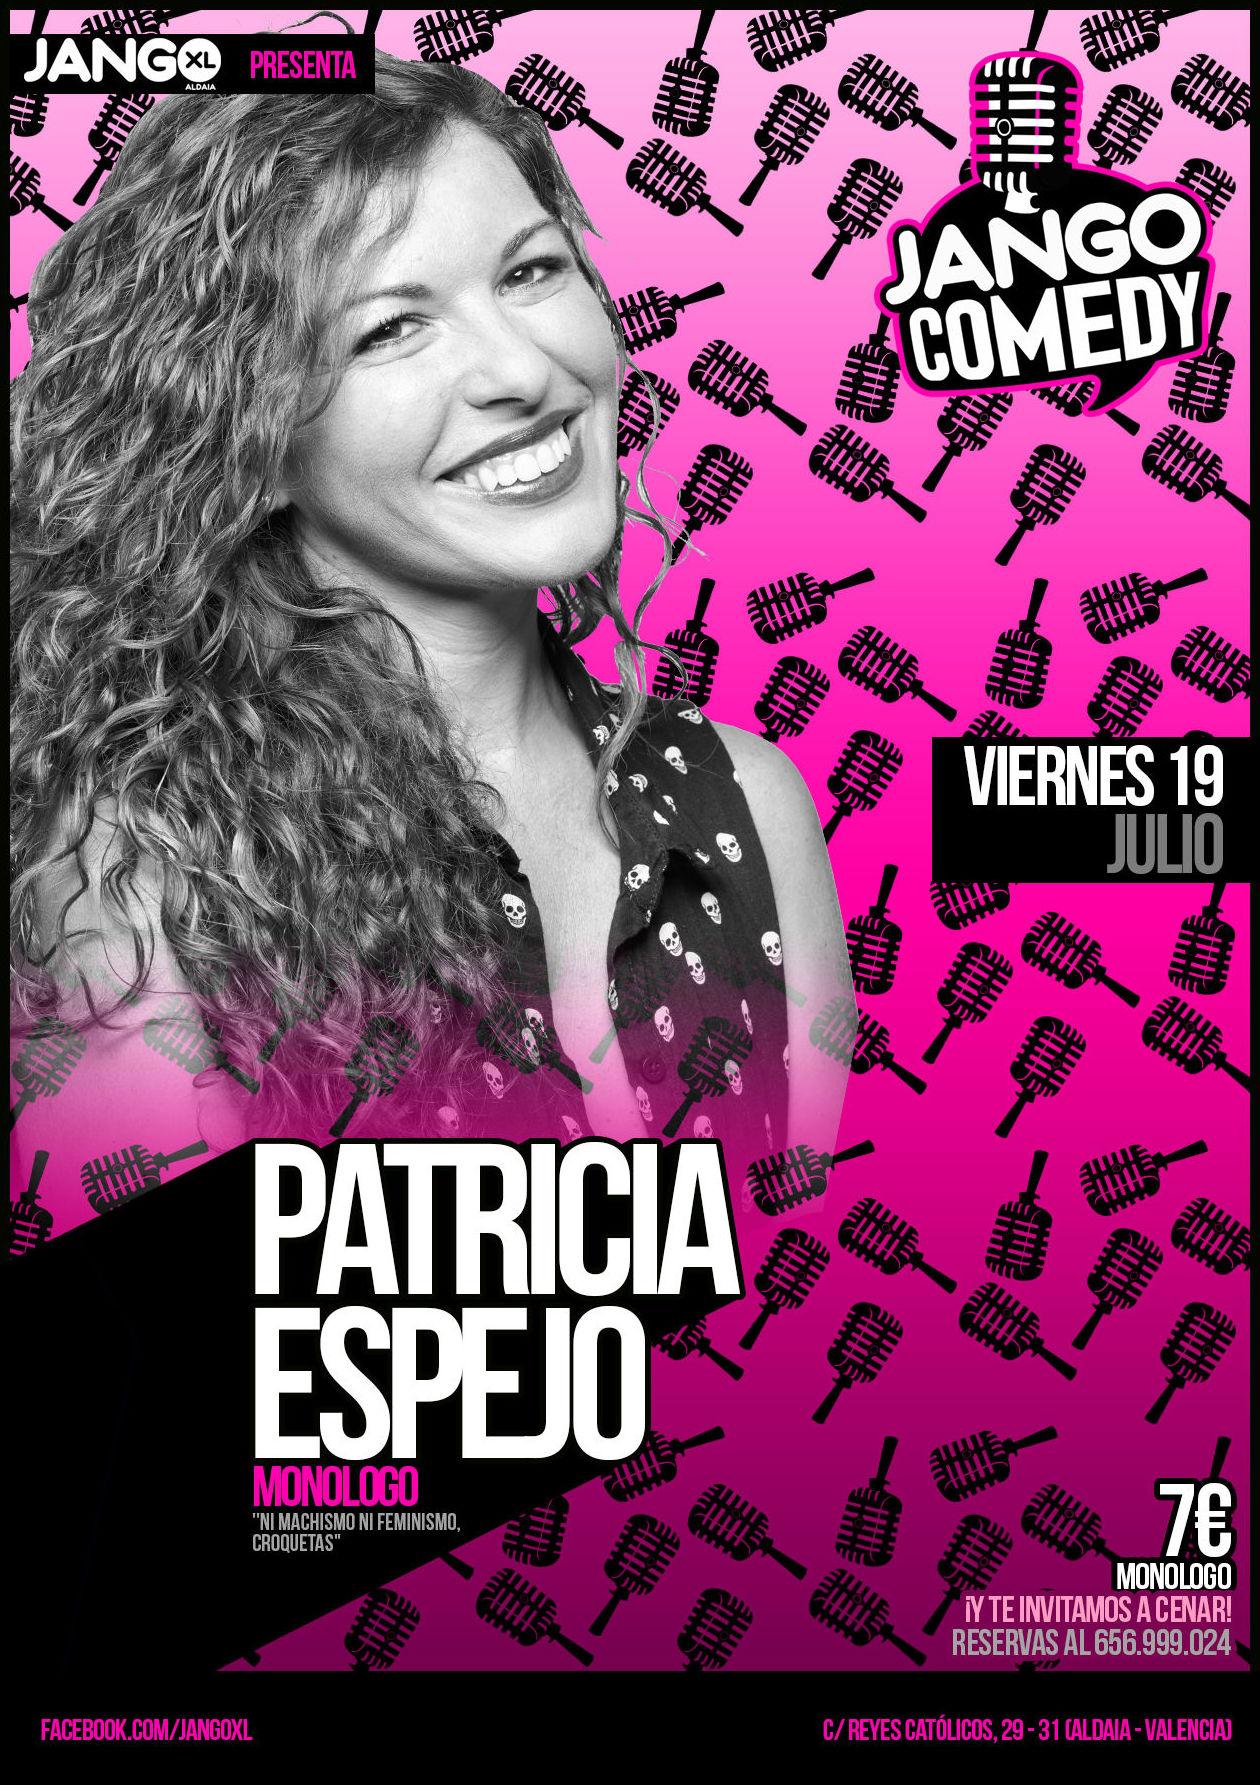 Jango Comedy presenta a Patricia Espejo